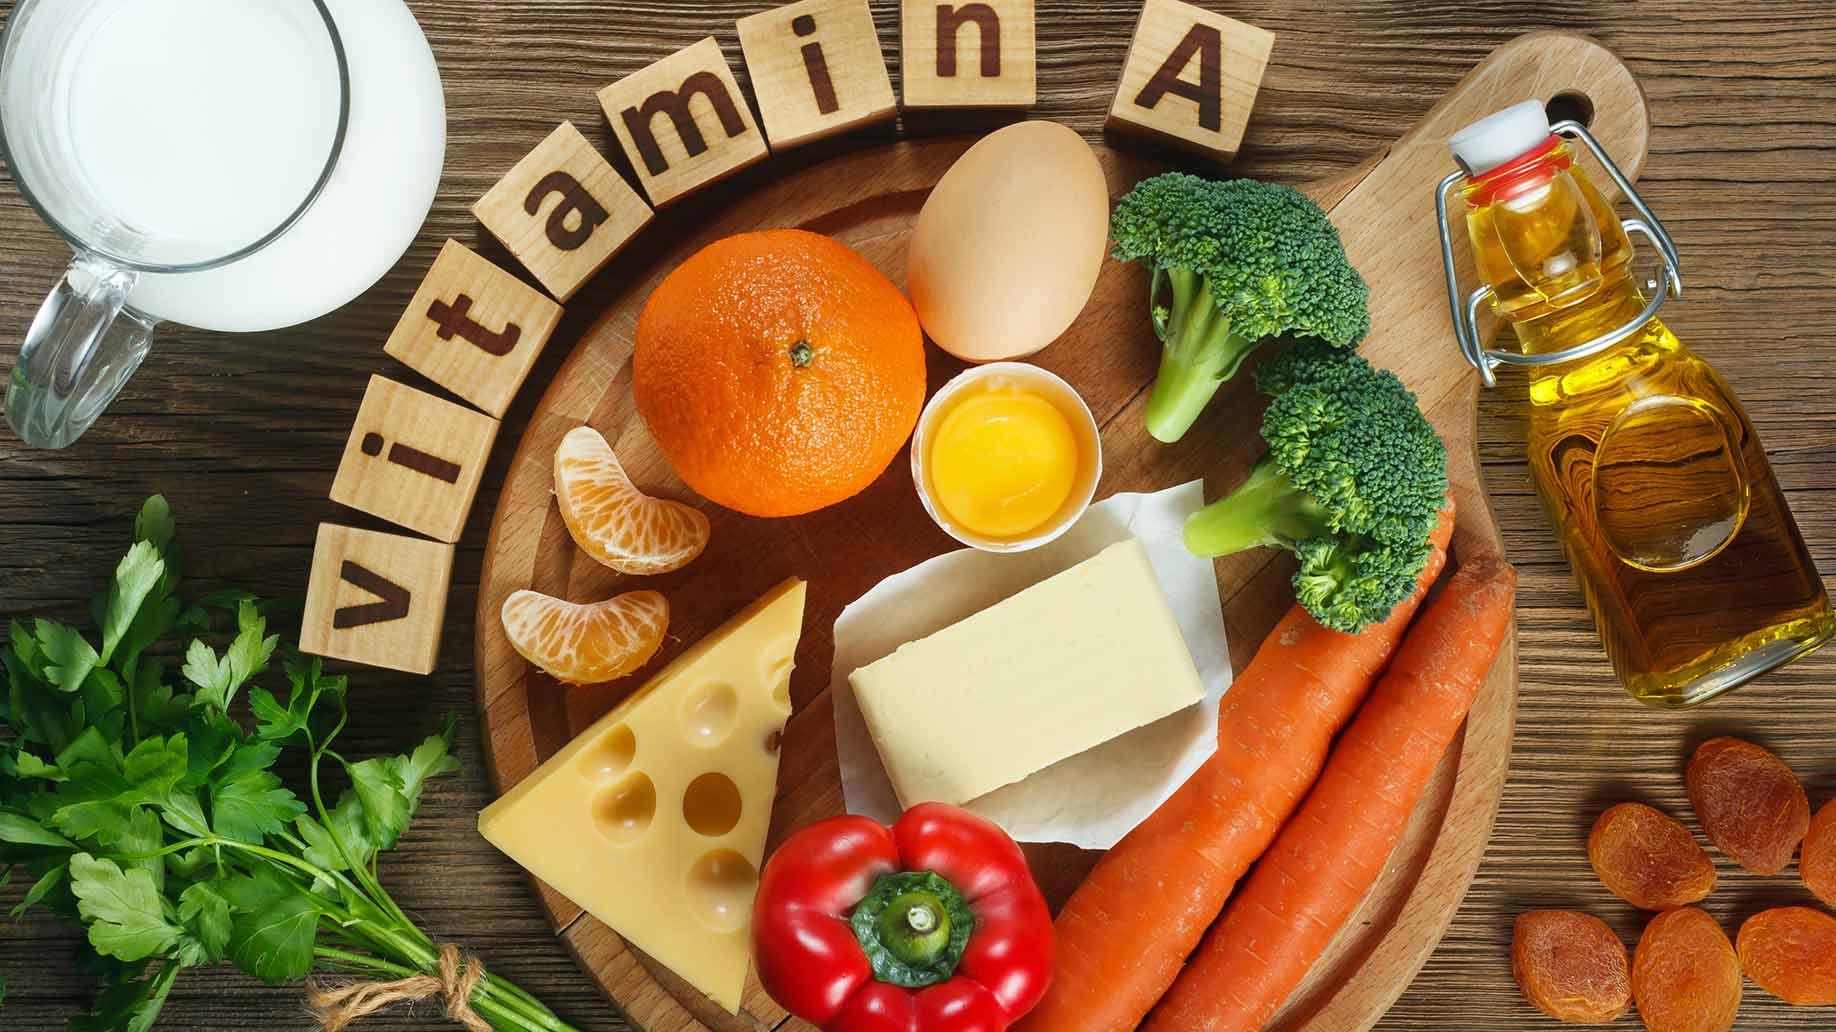 leaky gut vitamin a orange milk eggs broccoli carrots natural remedies